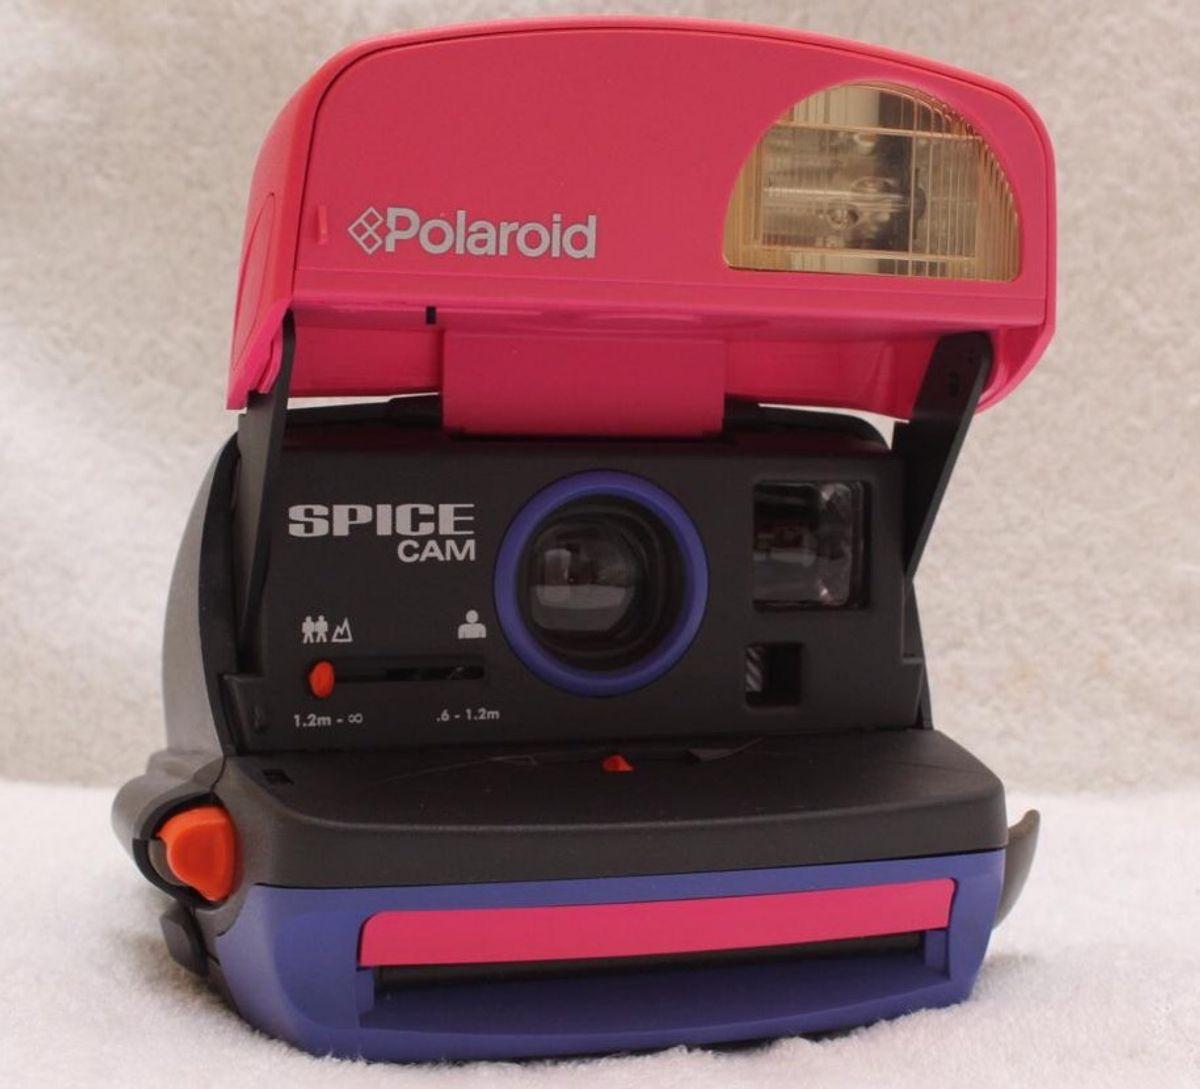 polaroid spice cam 600 - vintage e retrô polaroid